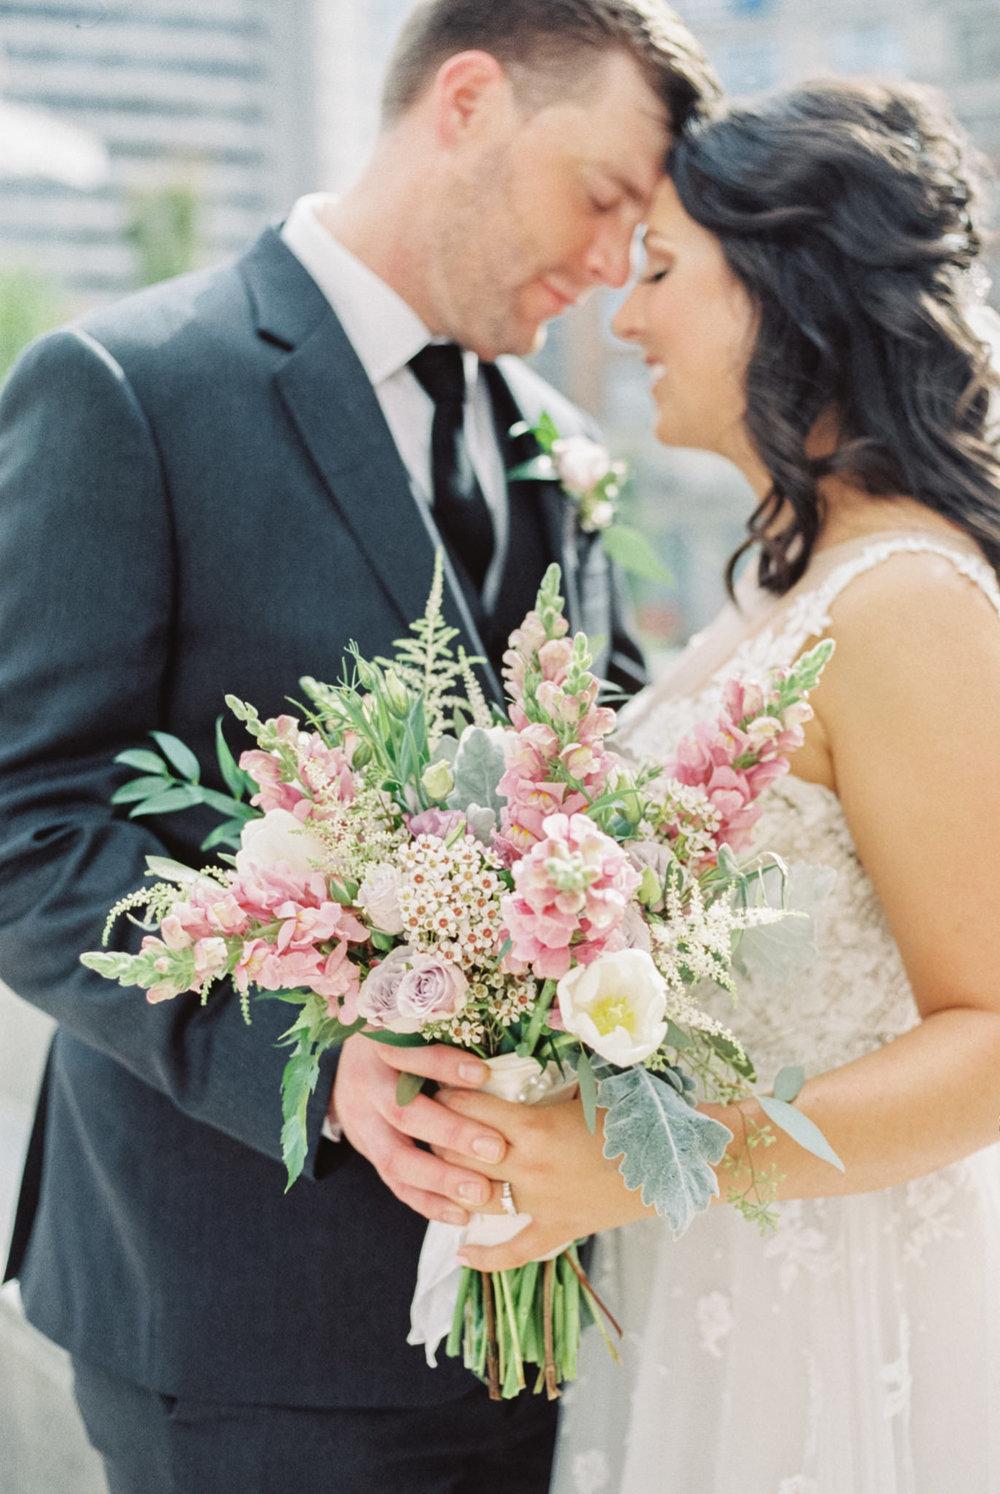 Louisville_Wedding_Mellwood_Arts_Center-24.jpg